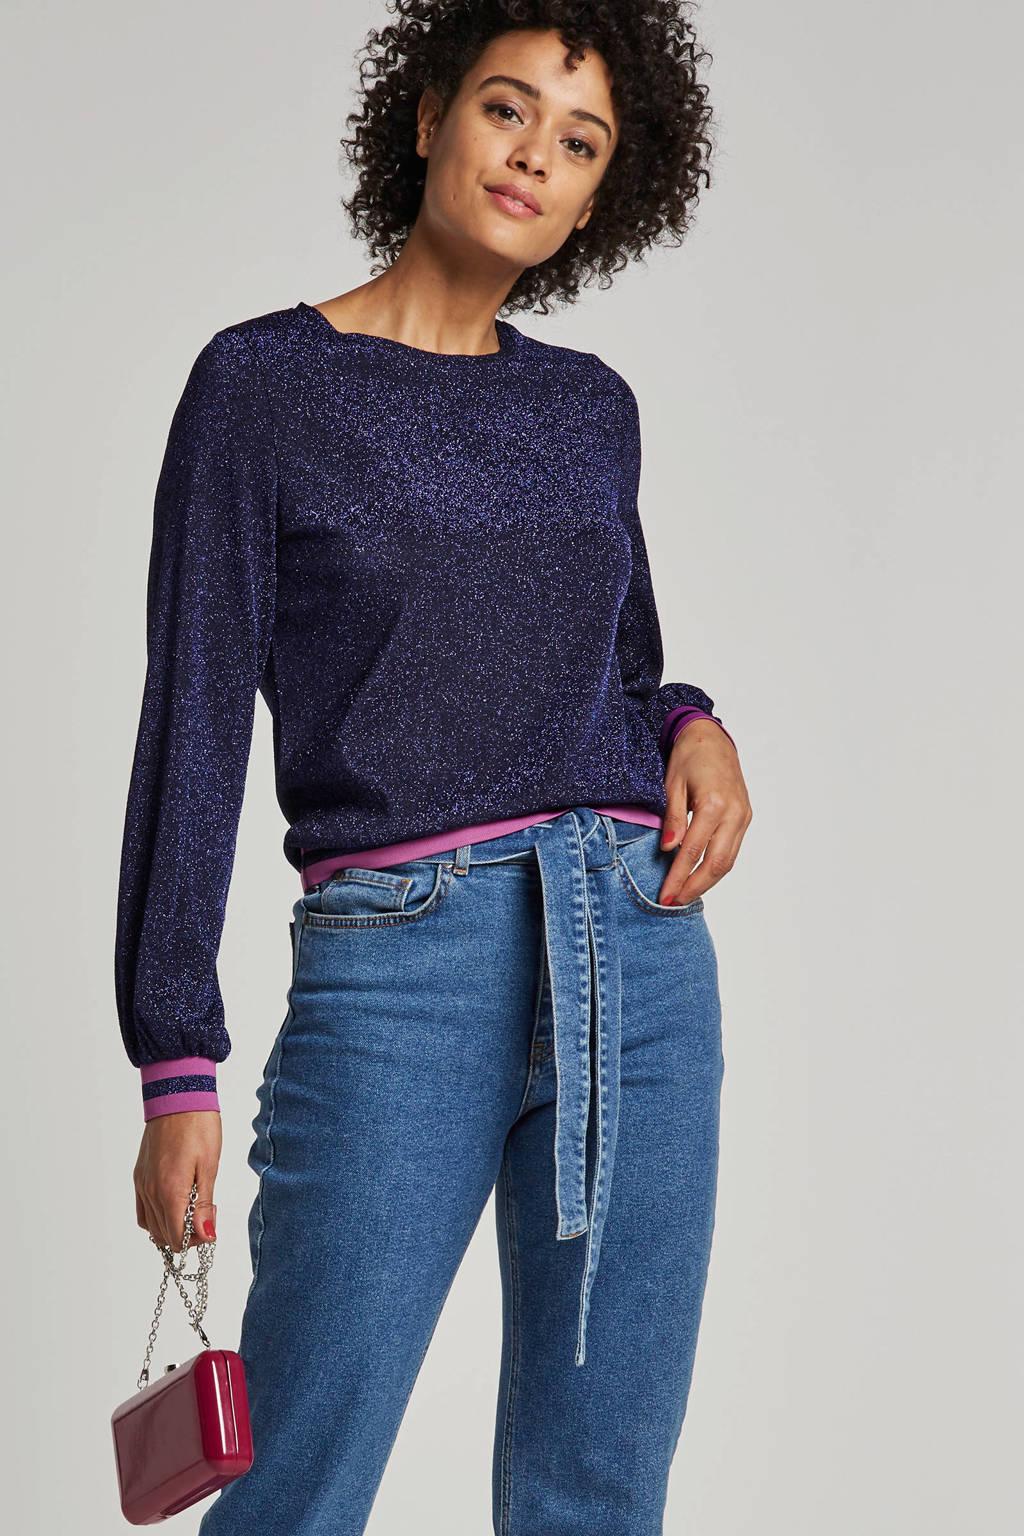 ONLY trui met glitter details en gekleurde rib boorden, Paars